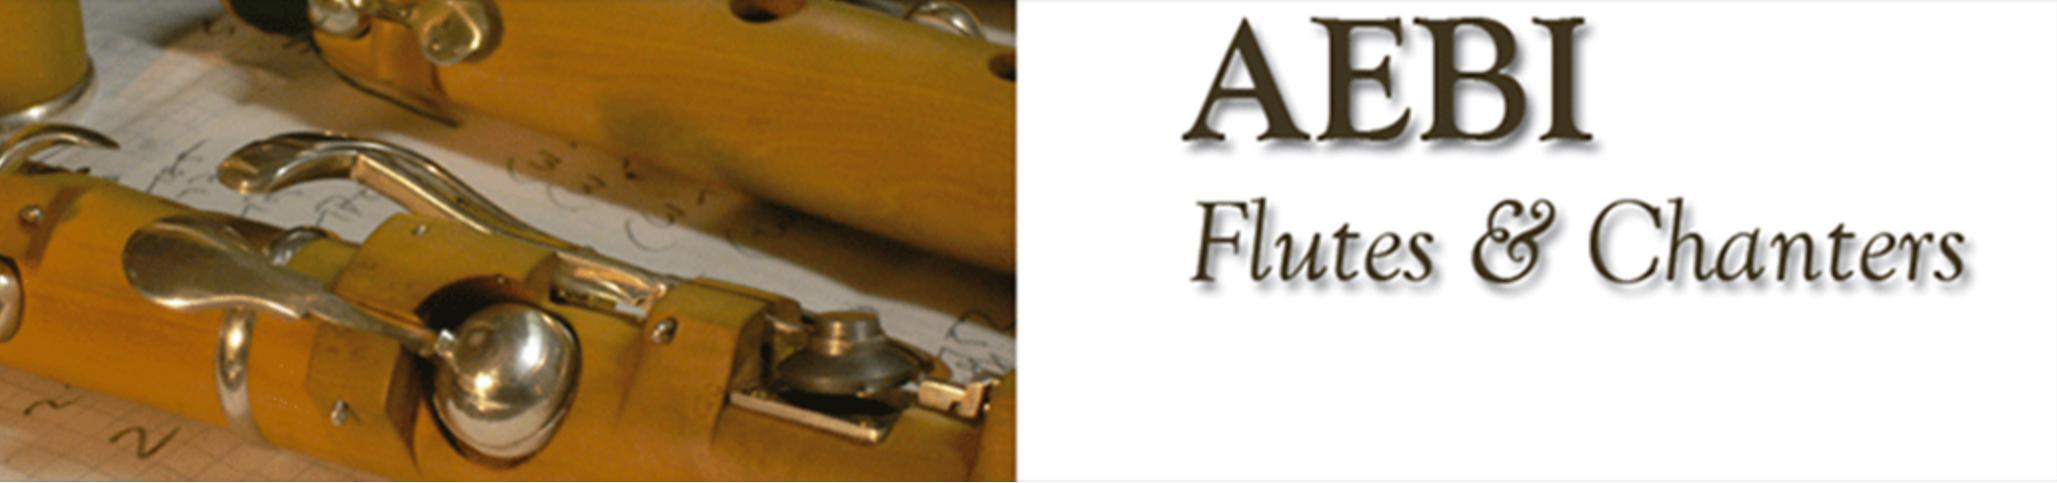 AEBI Flutes & Chanters